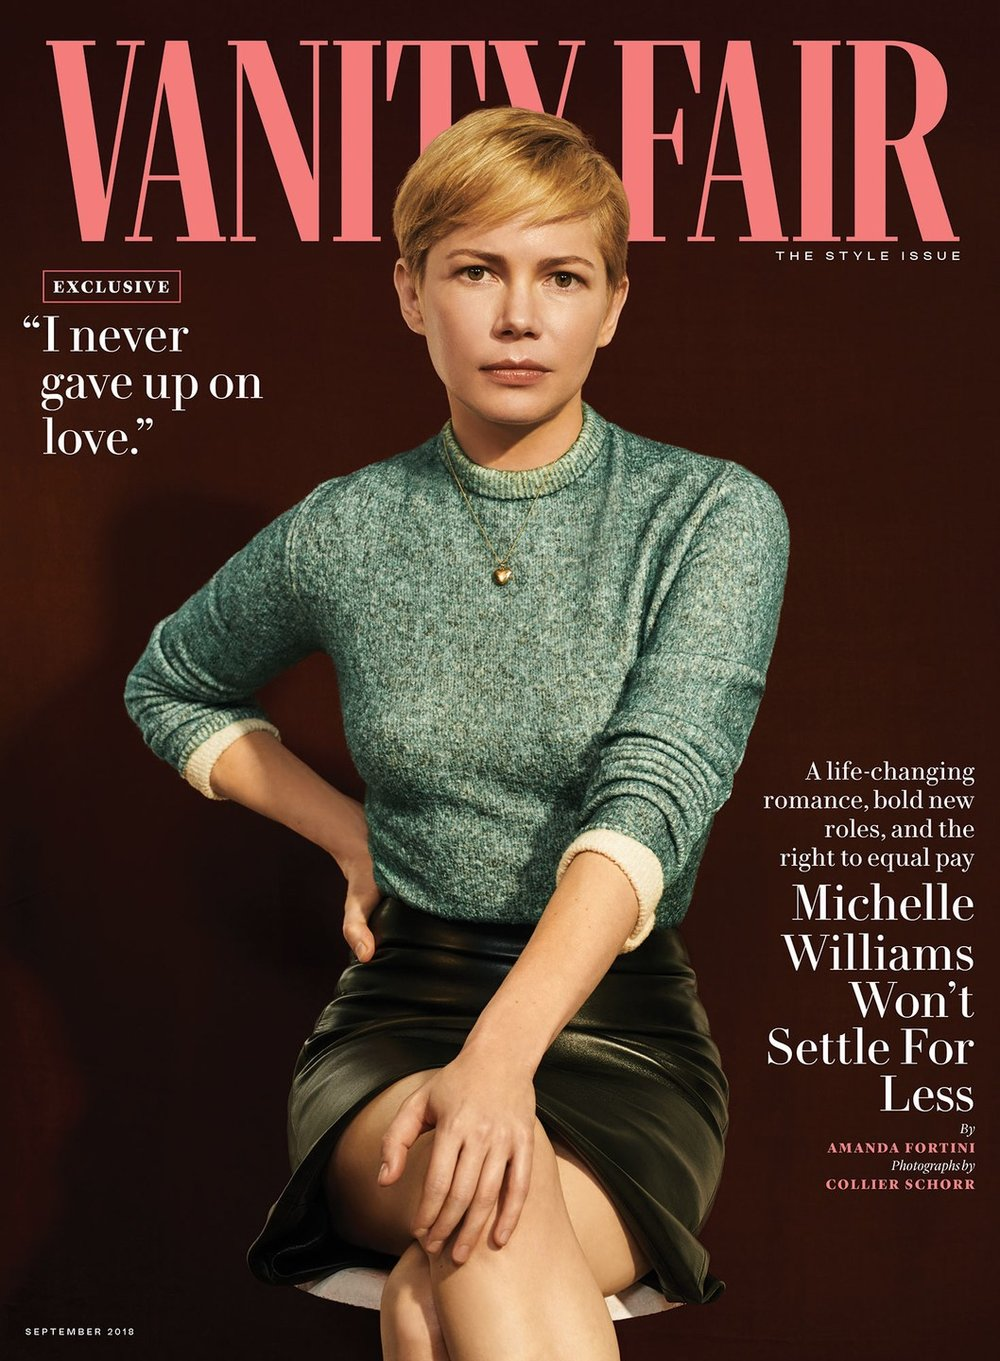 Michelle Williams by Collier Schorr for Vanity Fair Sept 2018 (5).jpg